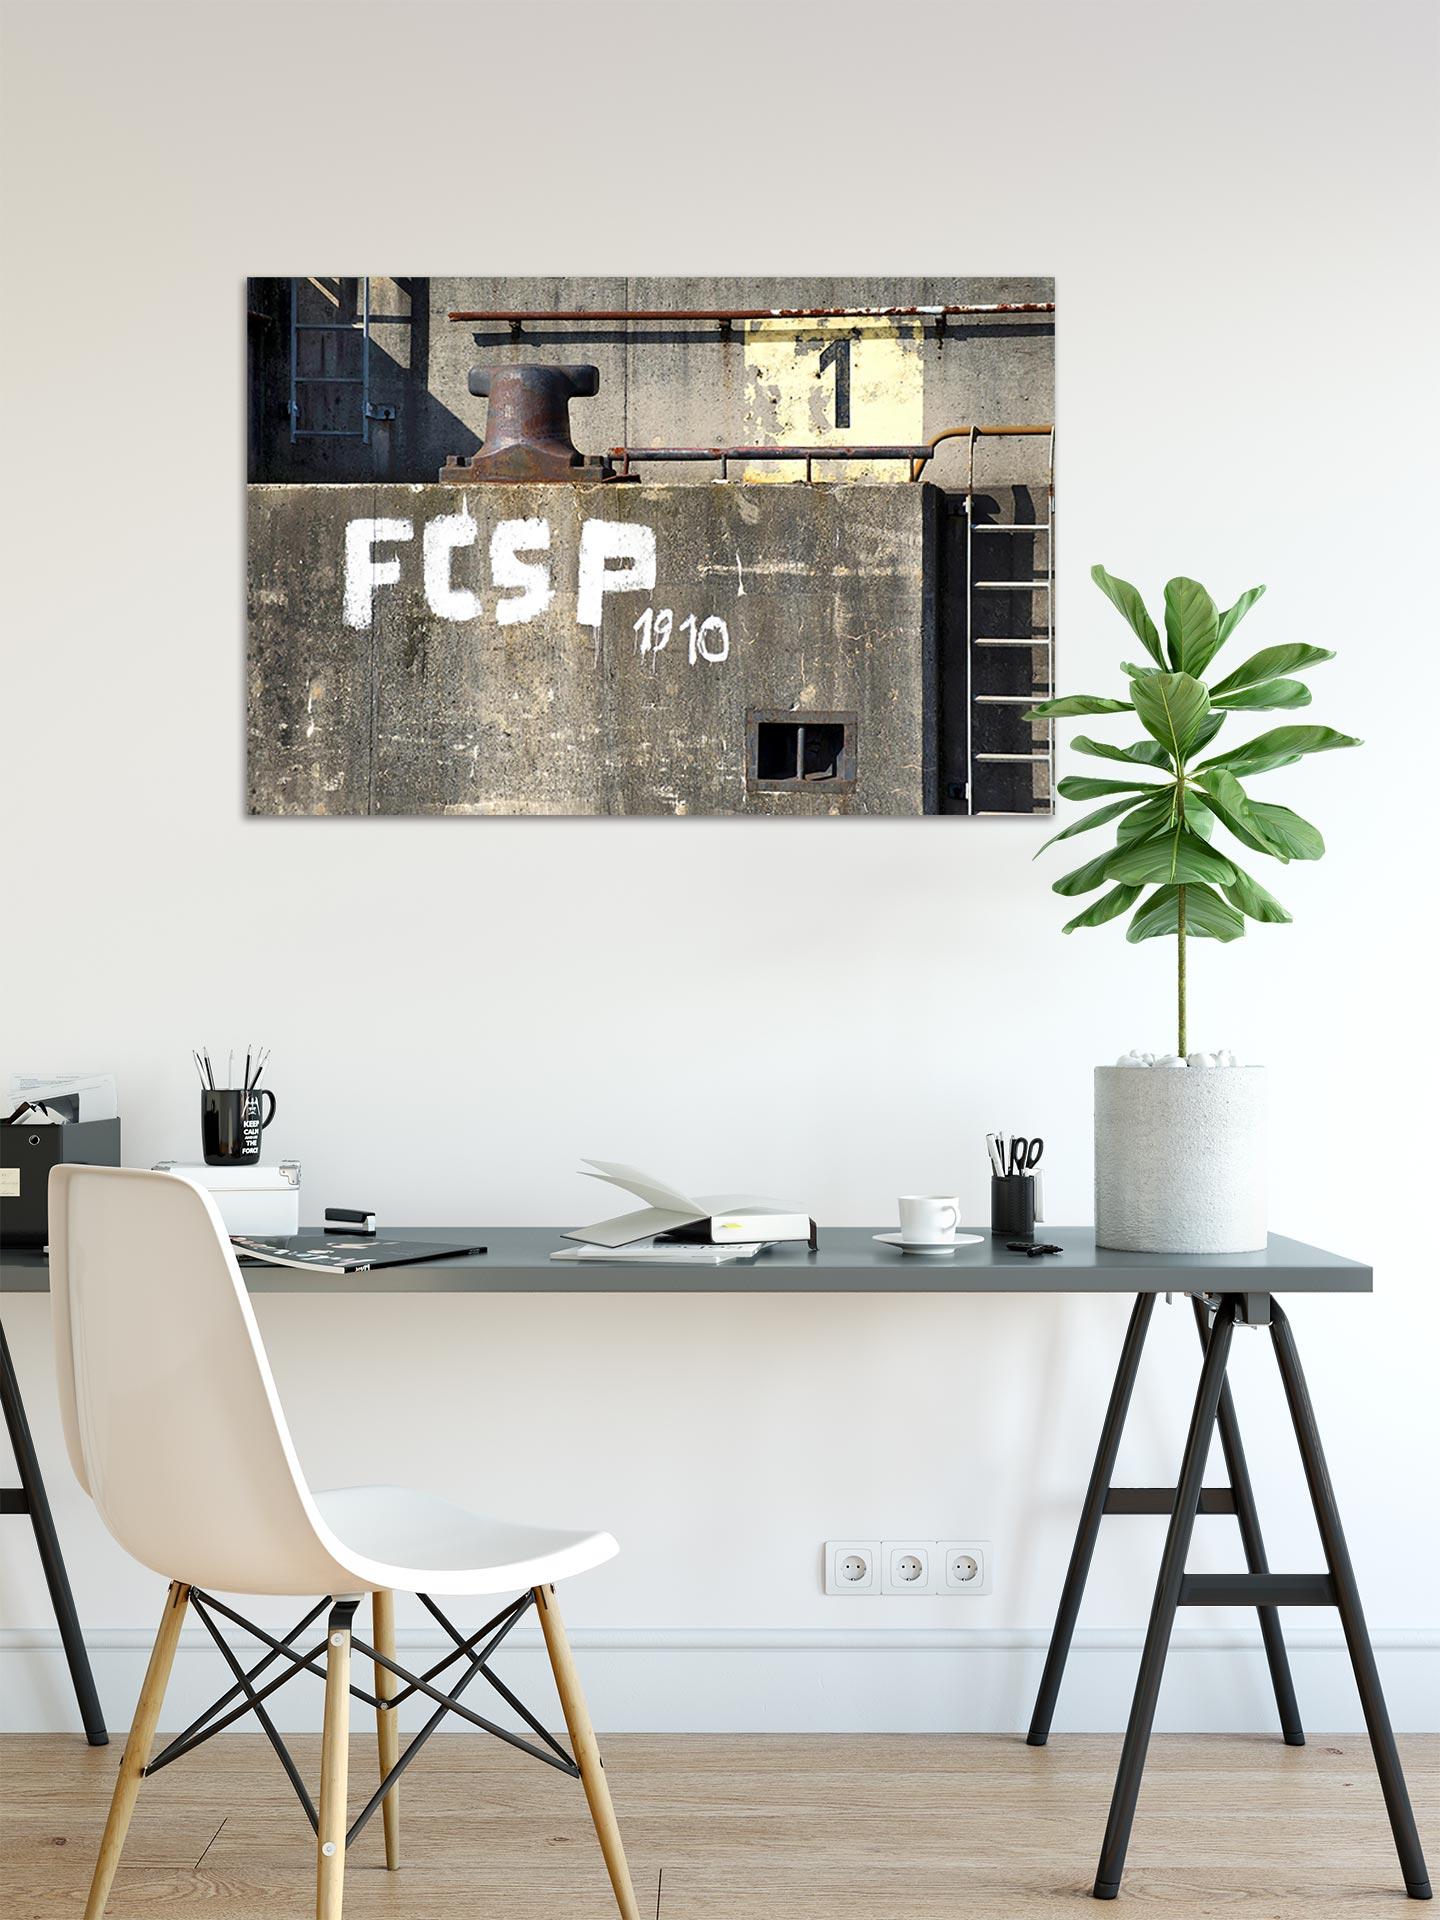 NL100-fcsp-hamburg-wandbild-bild-auf-leinwand-acrylglas-aludibond-arbeitszimmer